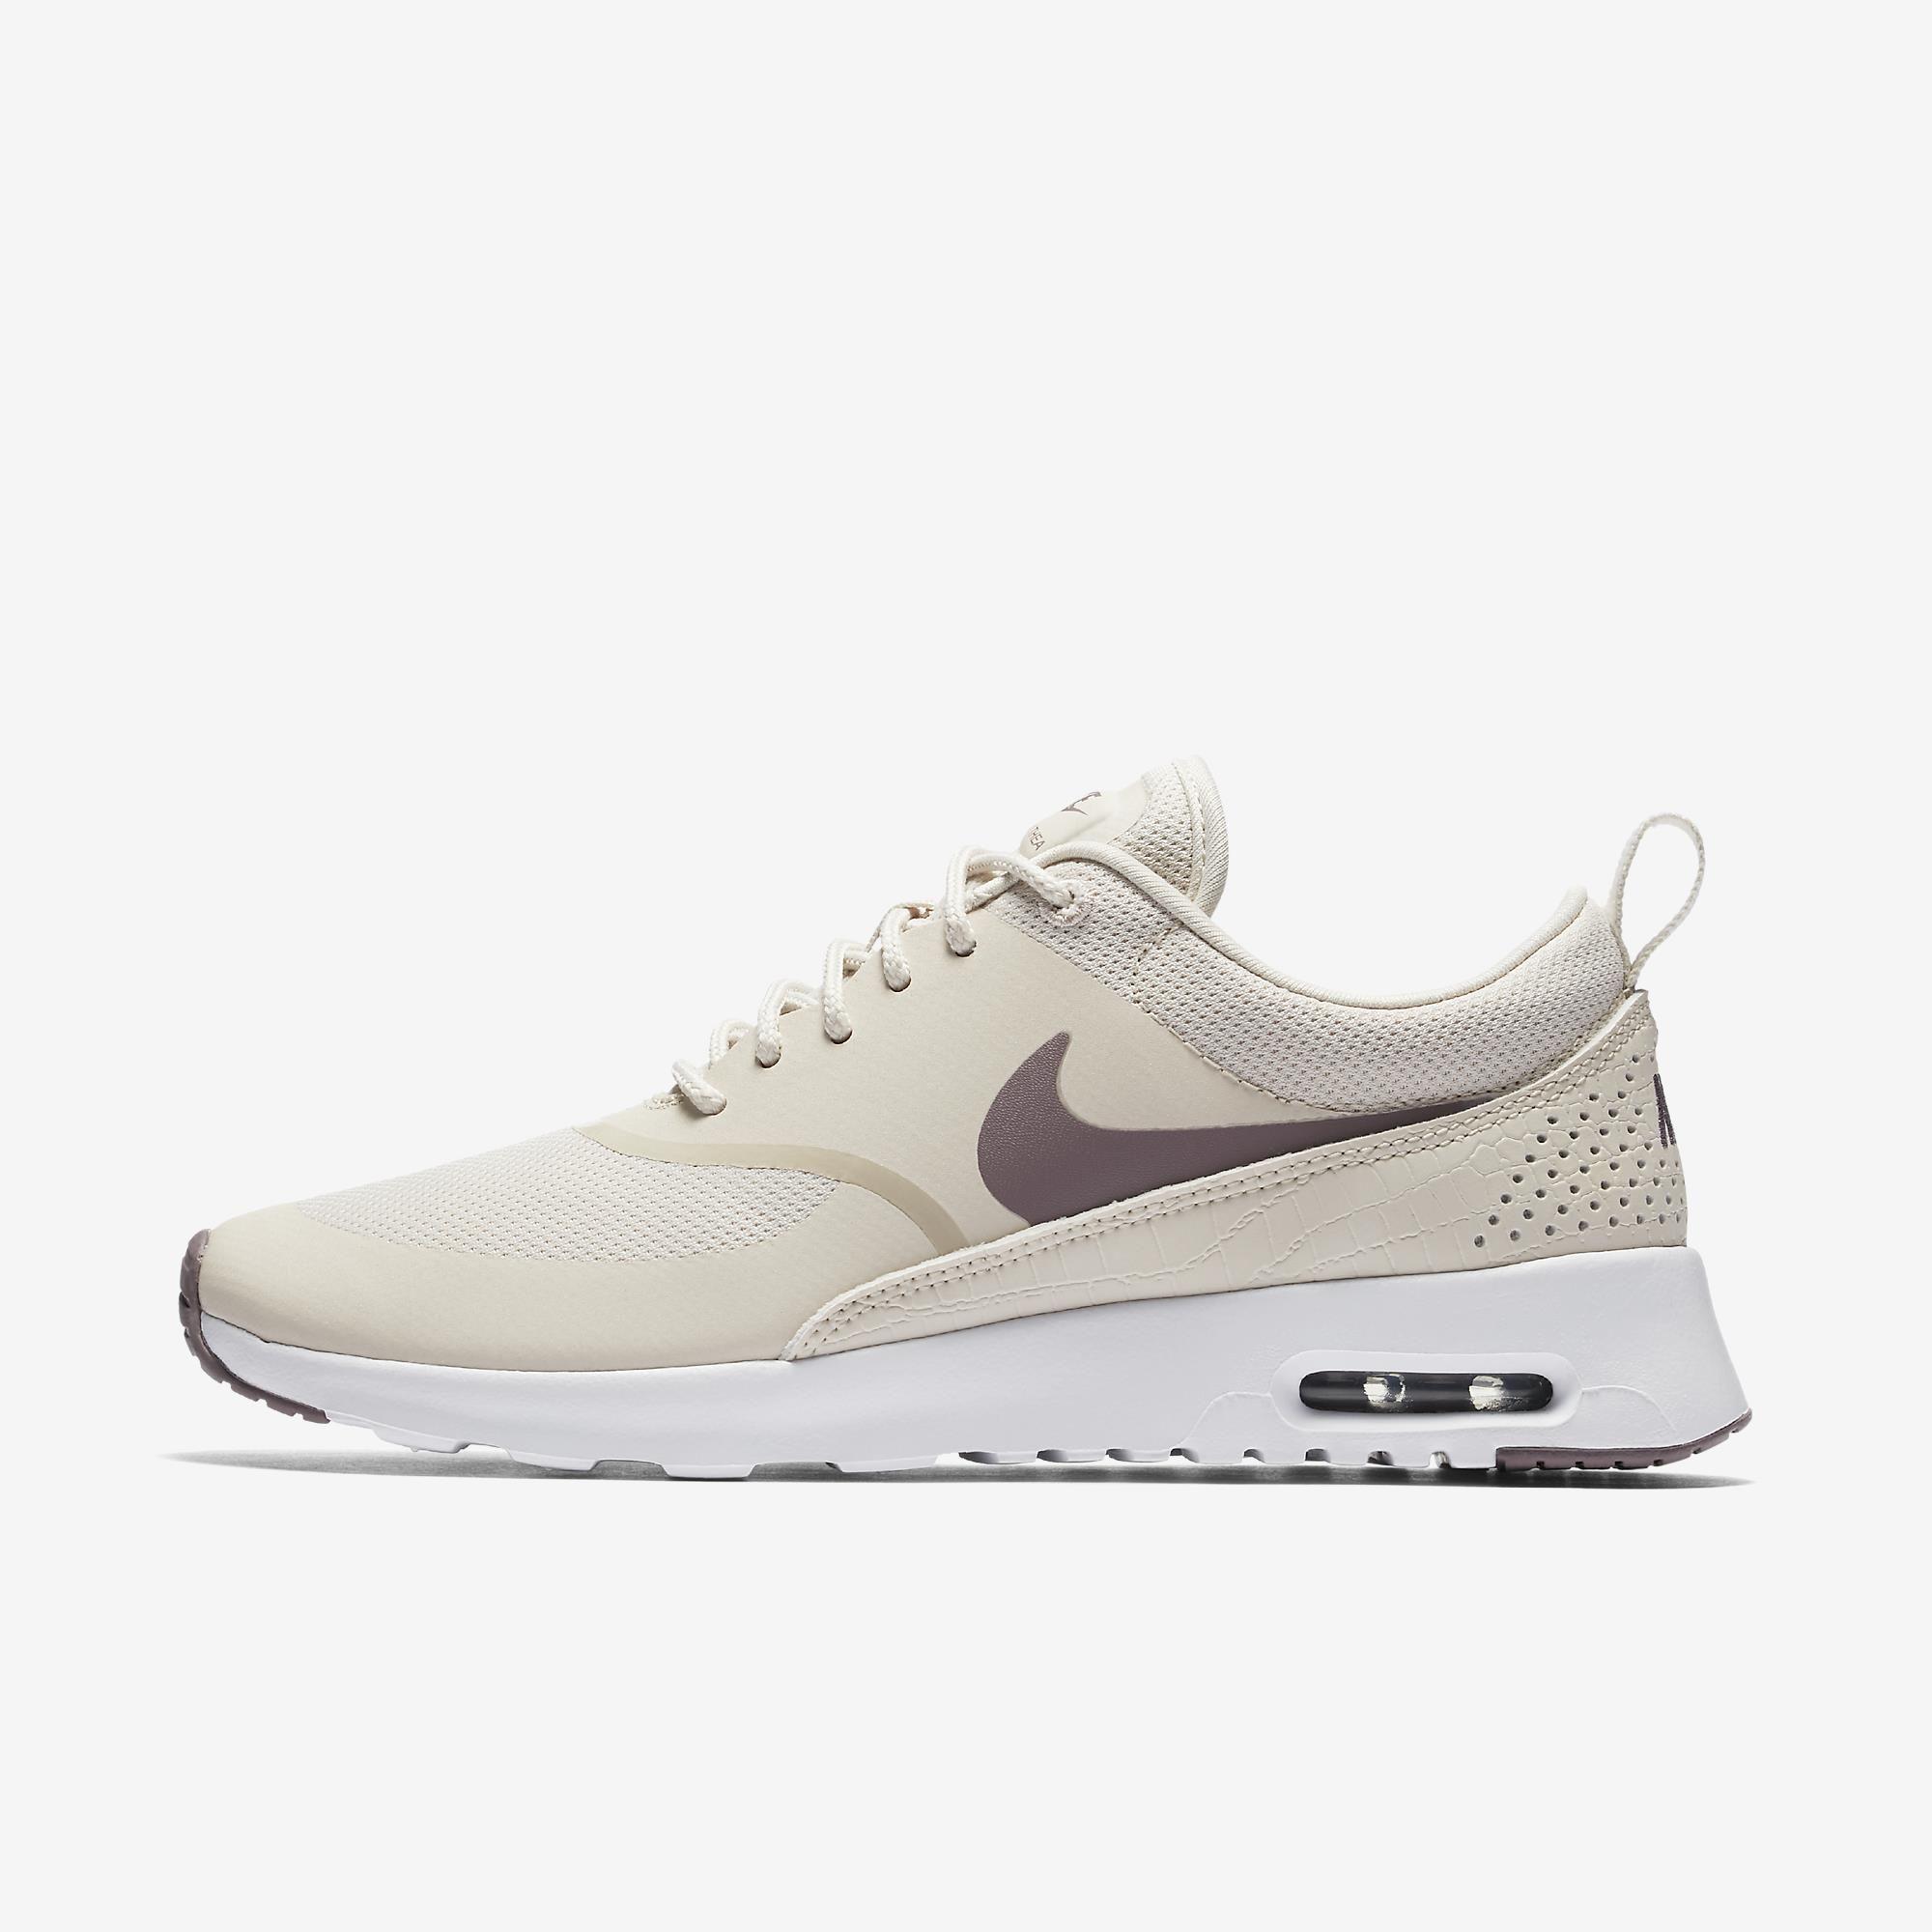 3f08918253 Tênis Nike Air Max Thea Feminino | Acessórios | Nike air max, Tenis ...